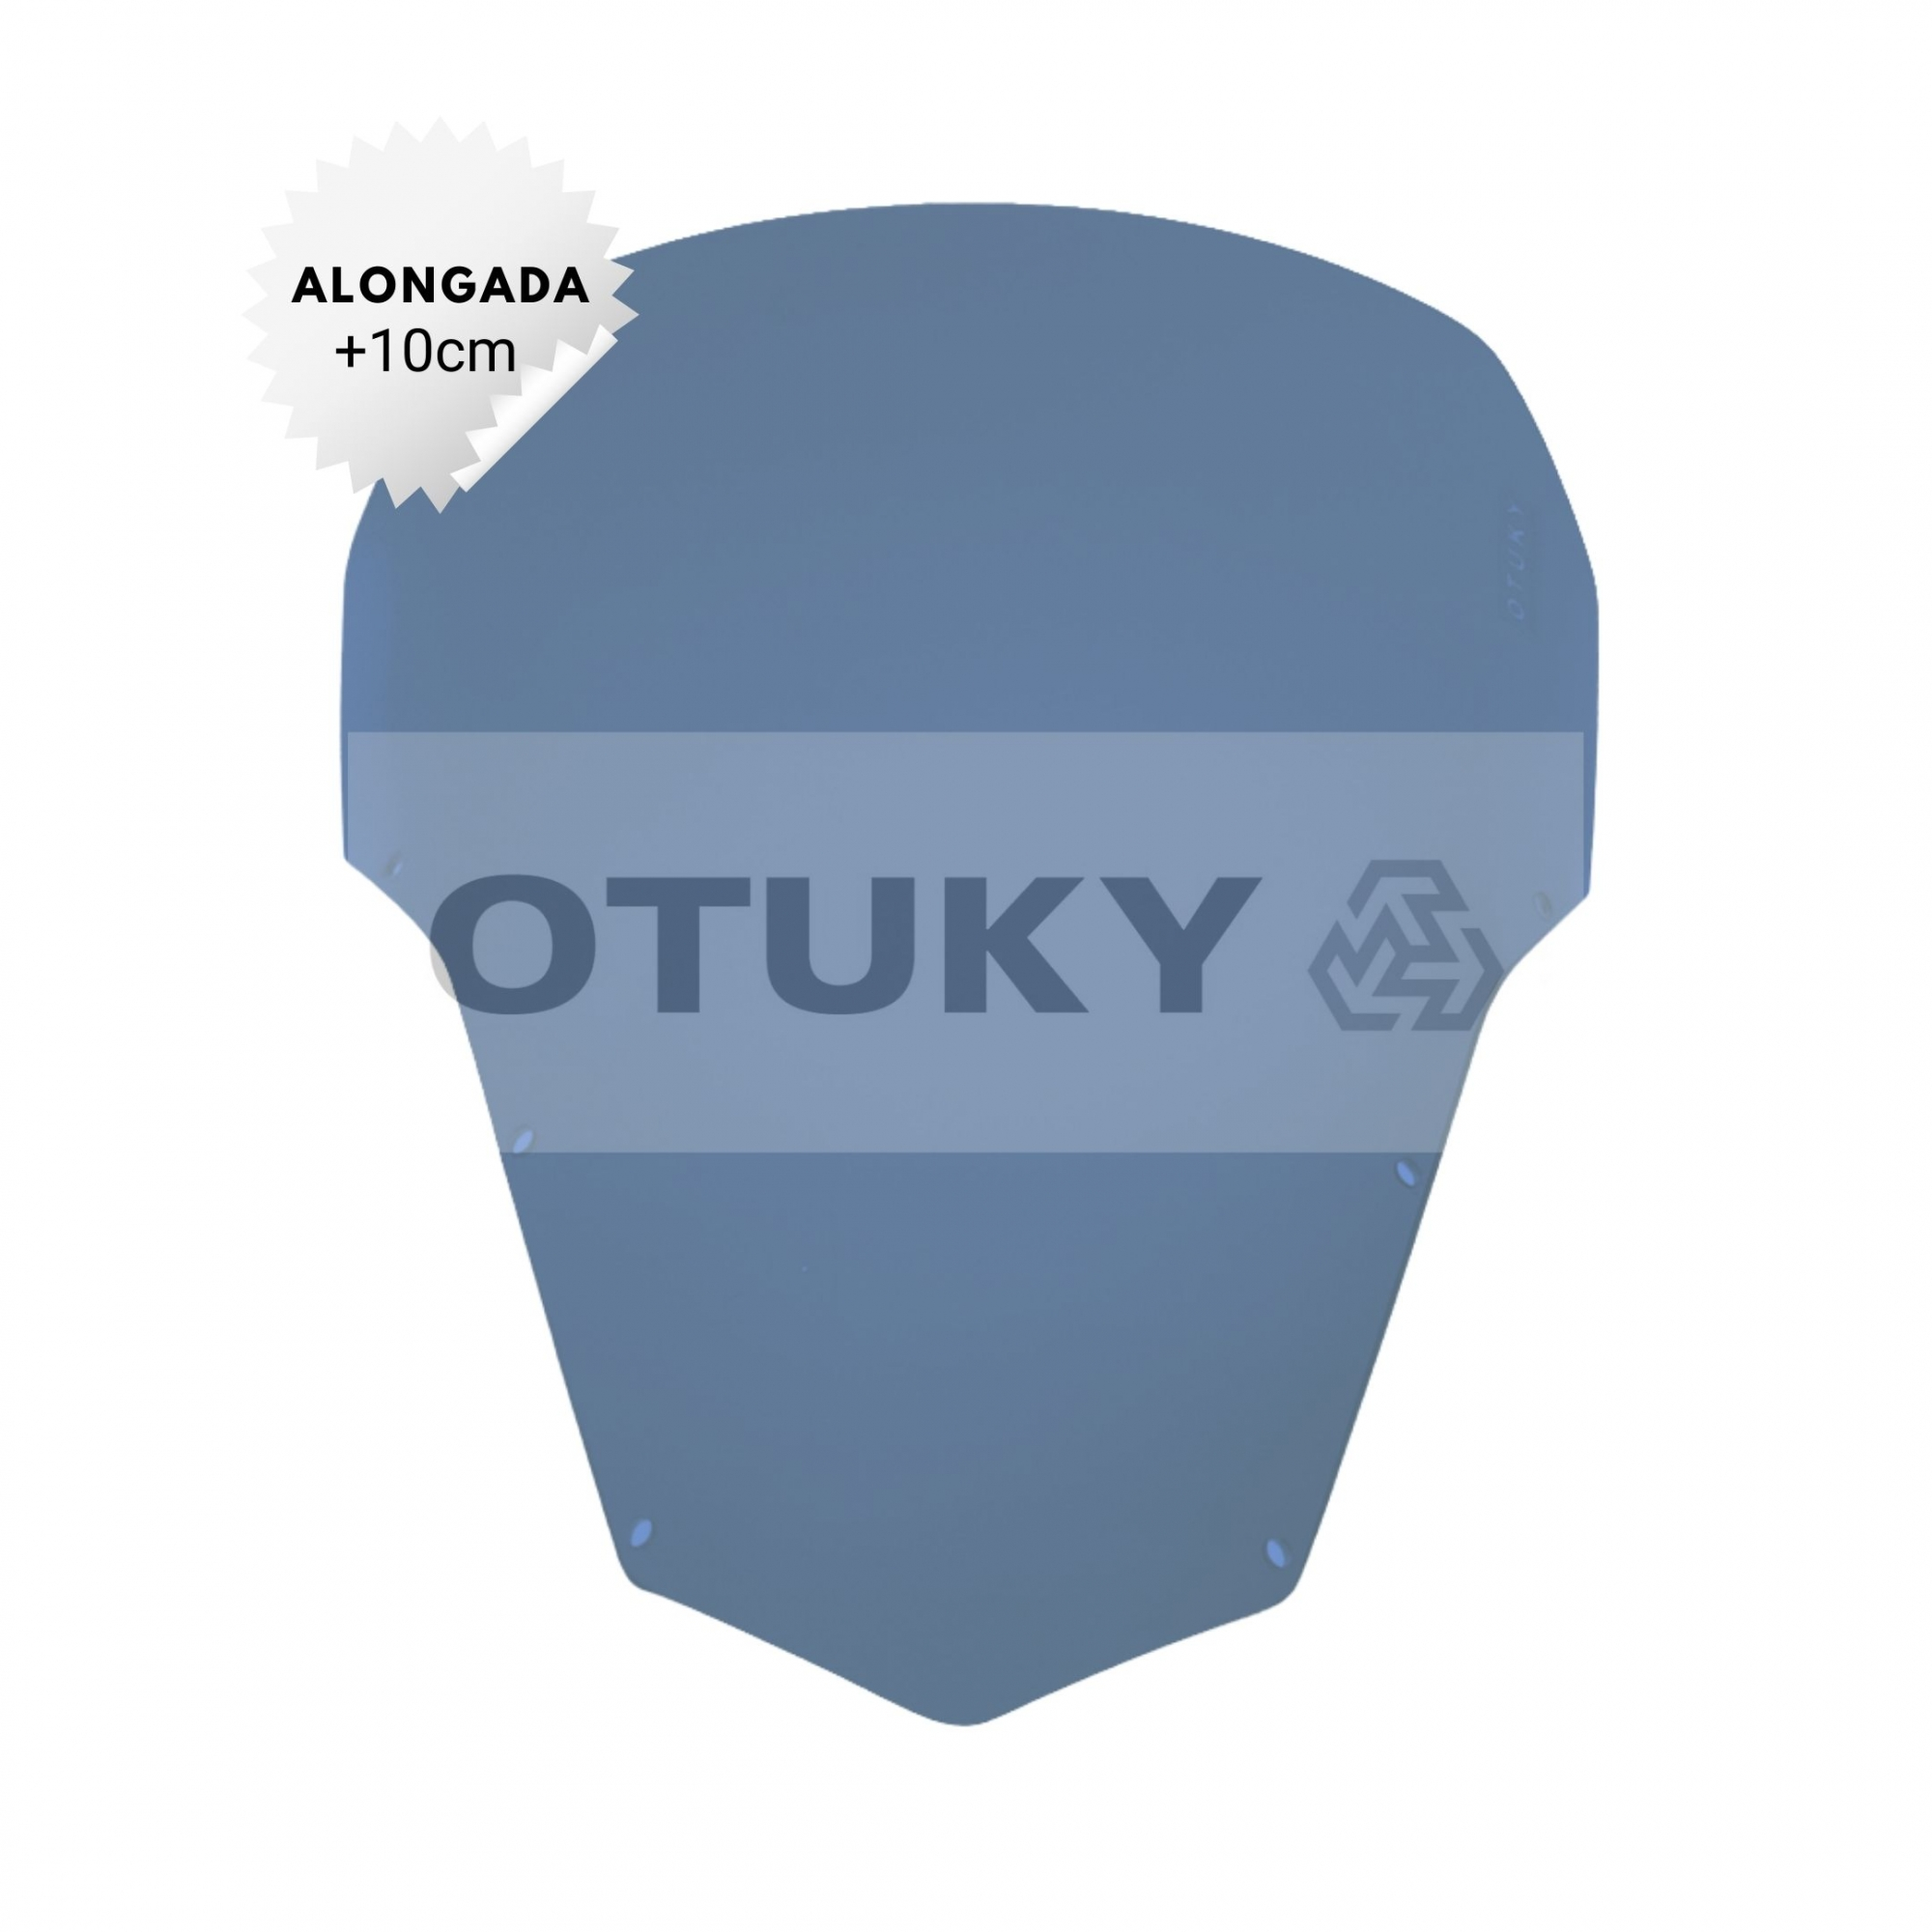 Bolha para Moto Fazer 600 FZ 6 S 2007 2008 2009 2010 Alongada +10cm Otuky